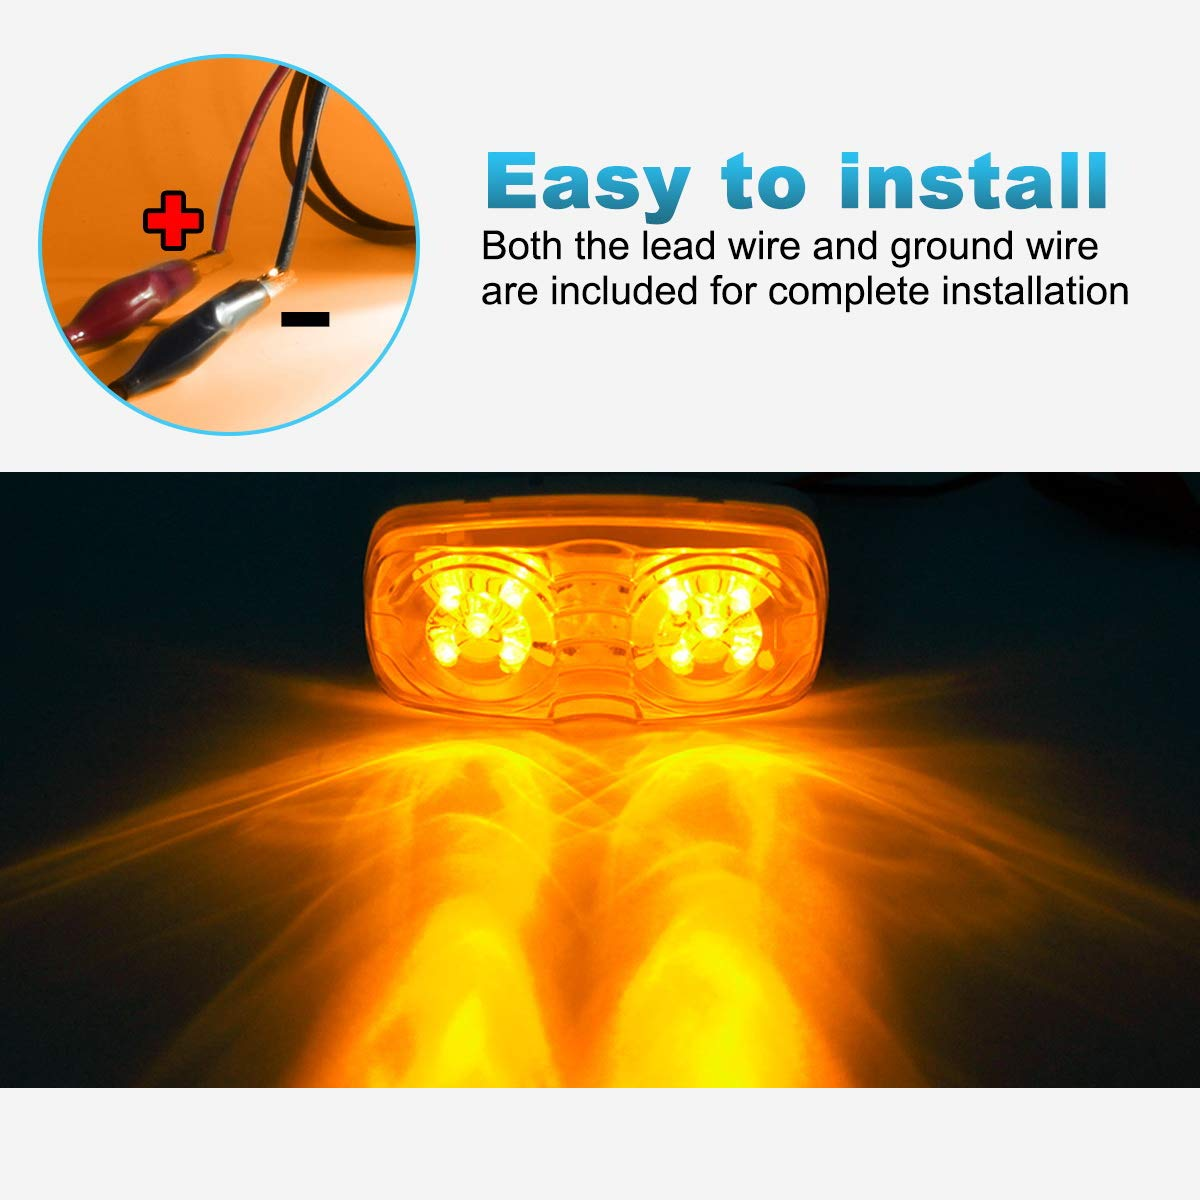 Partsam Five Trailer Marker LED Light Double Bullseye Amber 10 Diodes Clearance Light by Partsam (Image #4)